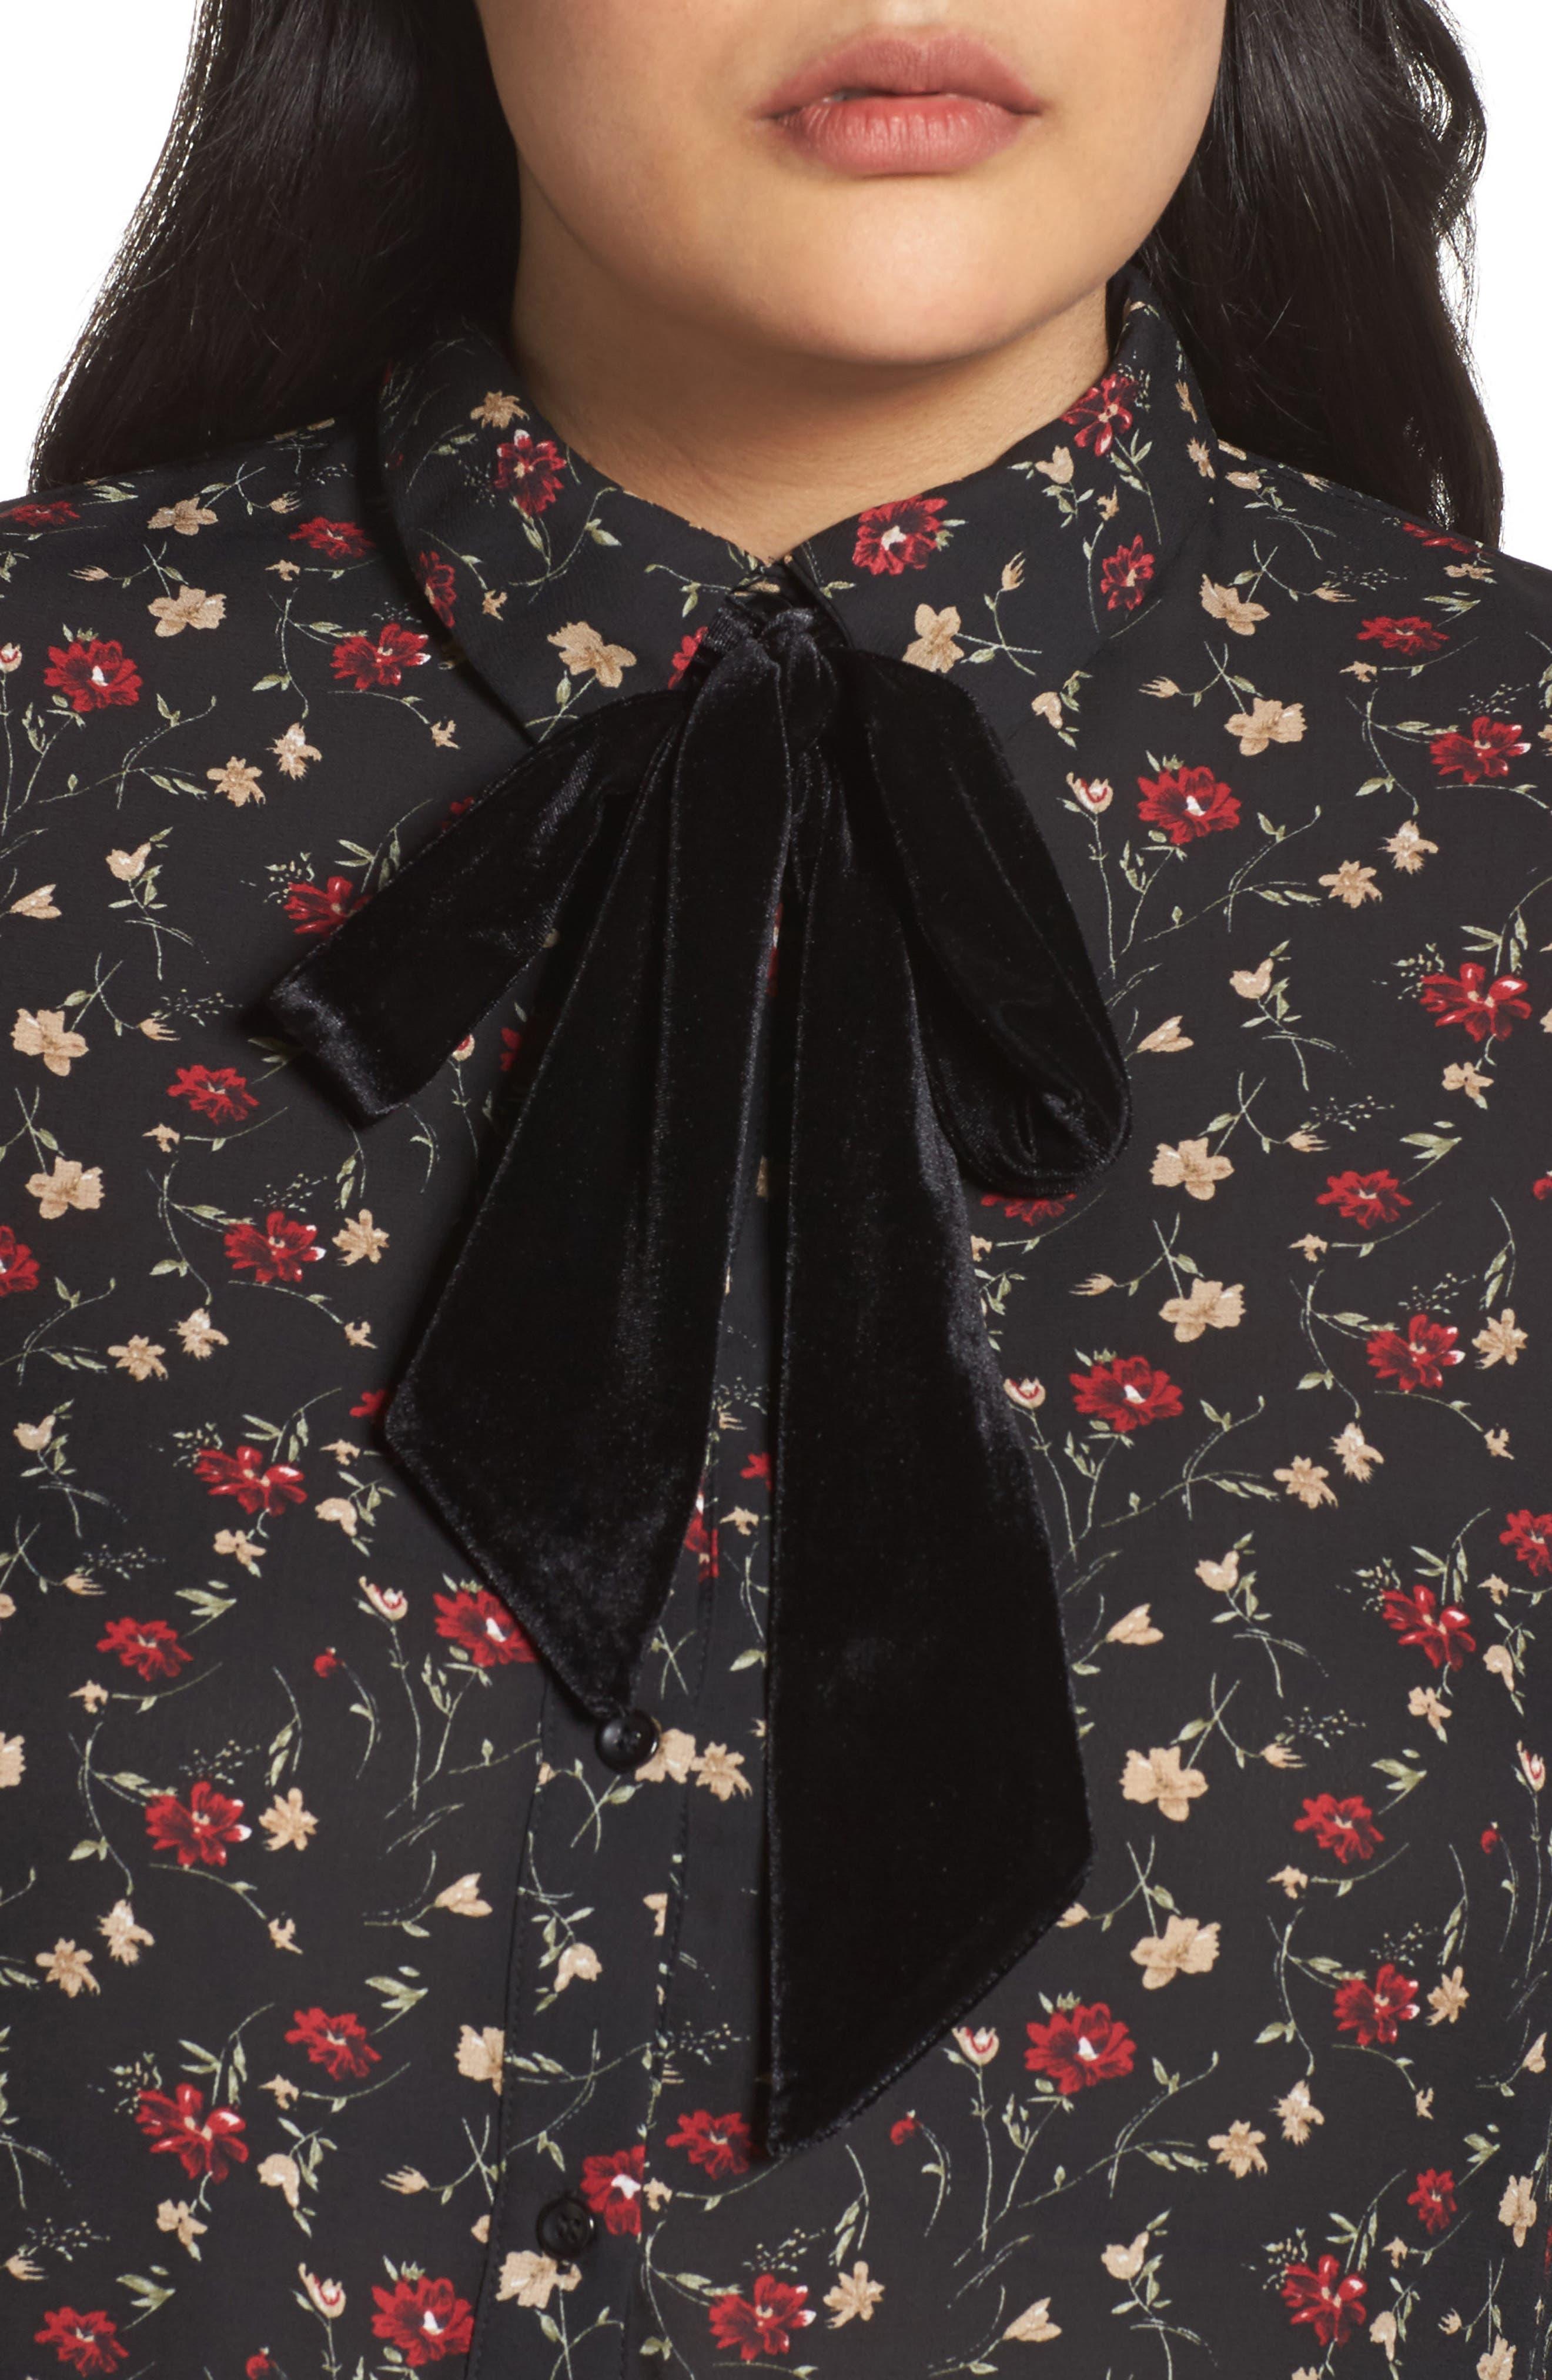 Velvet Tie Floral Blouse,                             Alternate thumbnail 4, color,                             Multi